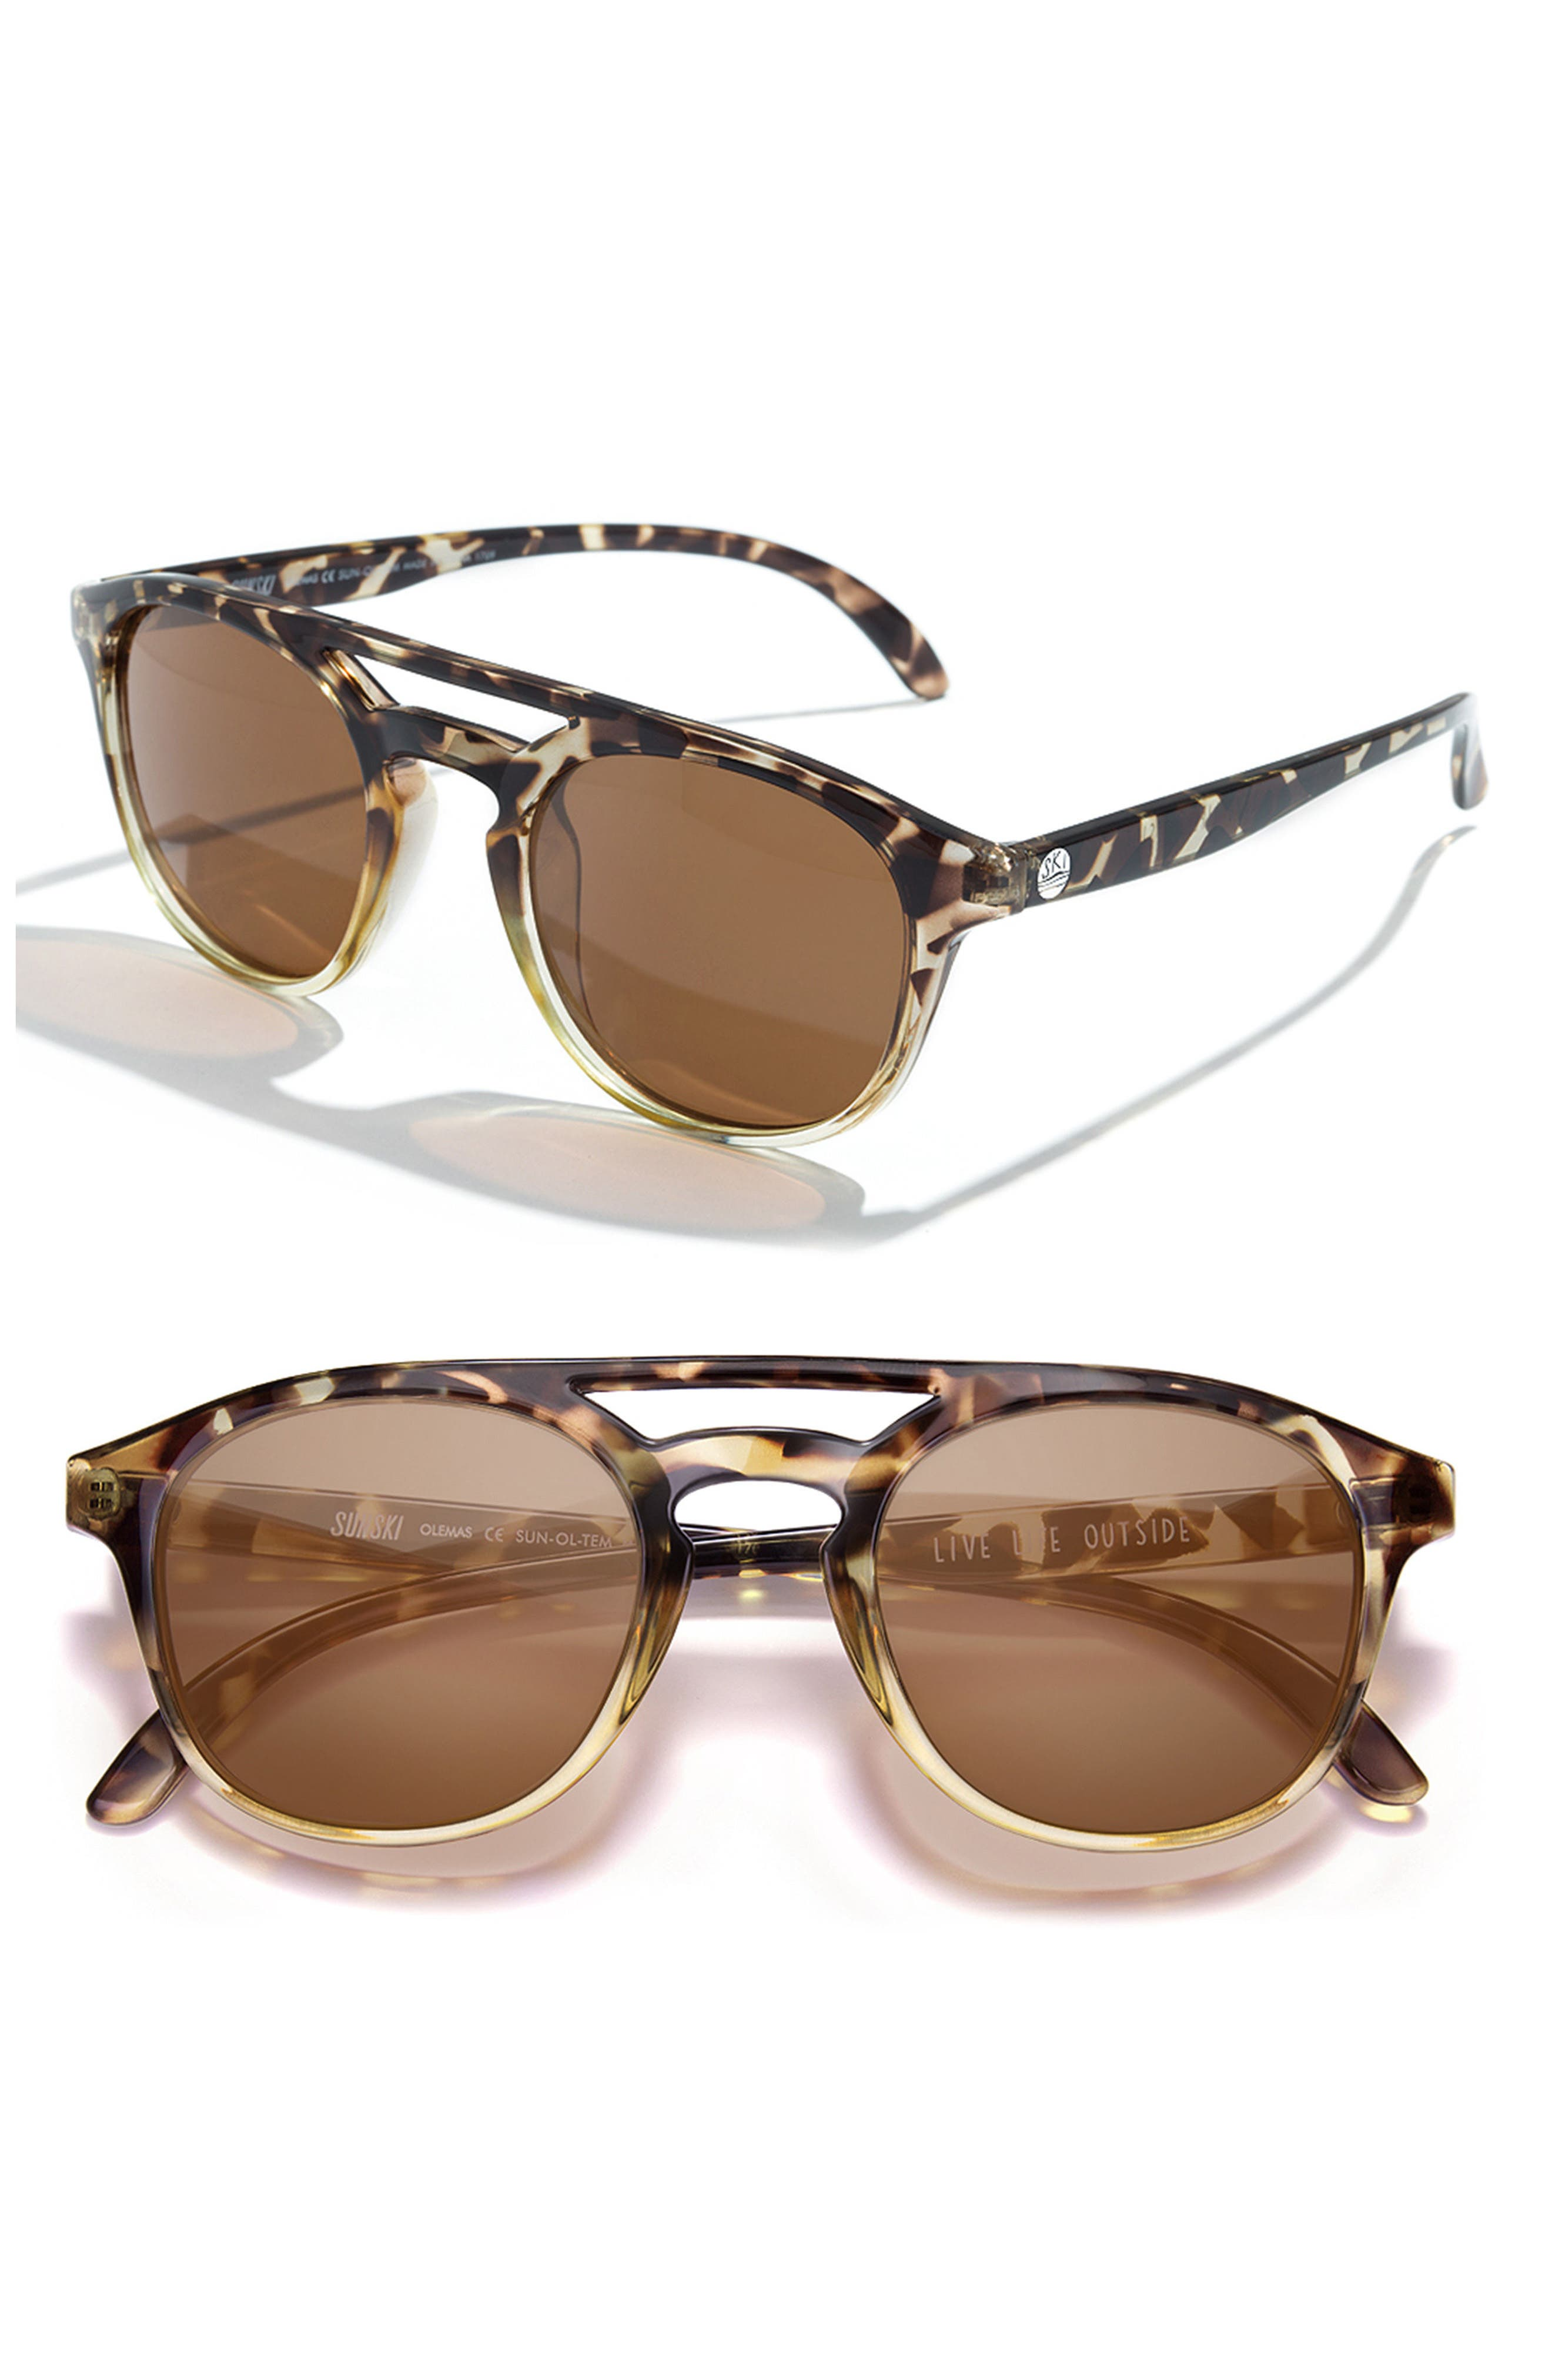 Olema 53mm Polarized Sunglasses,                             Main thumbnail 1, color,                             TORTOISE AMBER